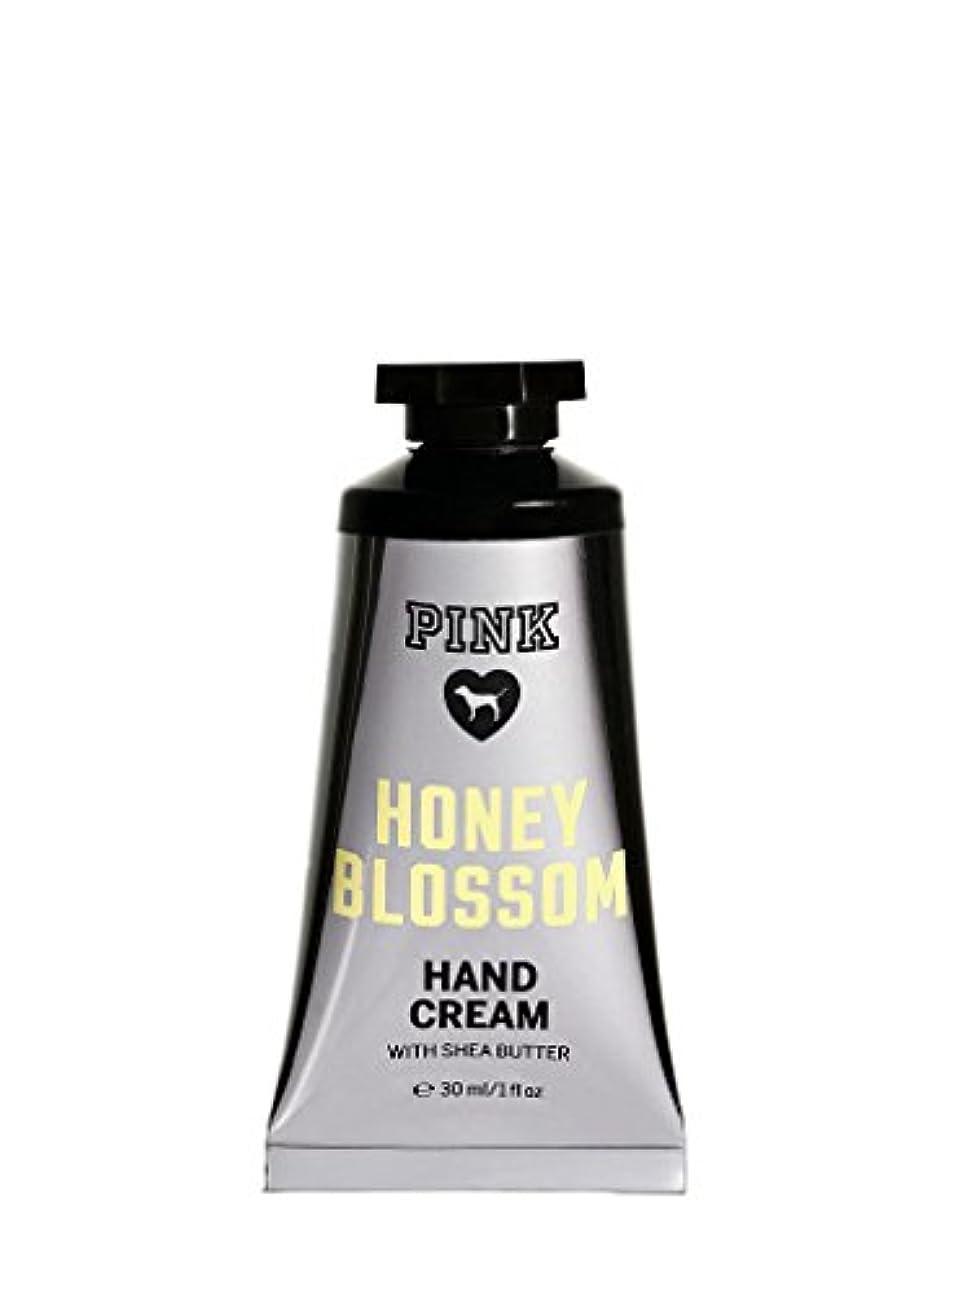 VICTORIA'S SECRET ヴィクトリアシークレット/ビクトリアシークレット PINK ハニーブロッサム ハンドクリーム/PINK HAND CREAM [並行輸入品]